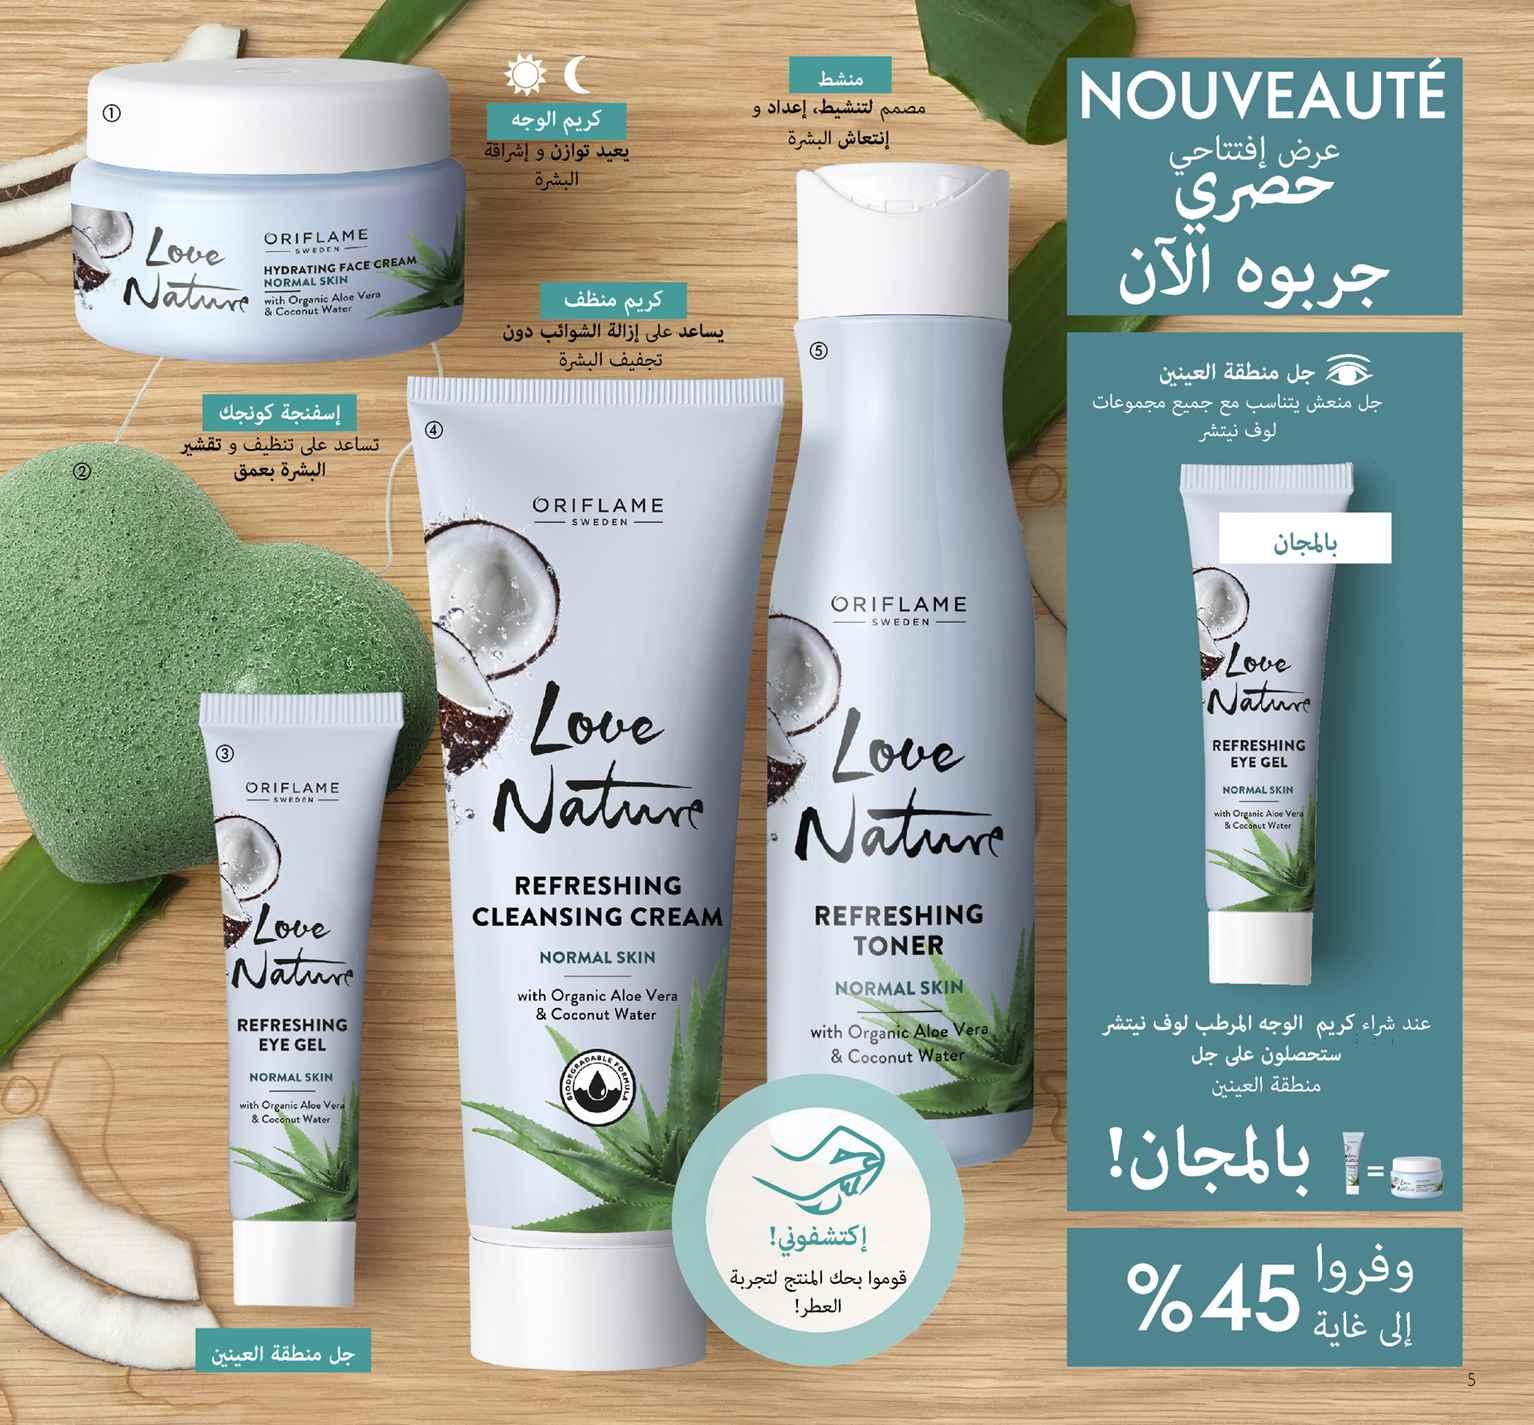 Oriflame Catalogue Juillet - 2019 Maroc